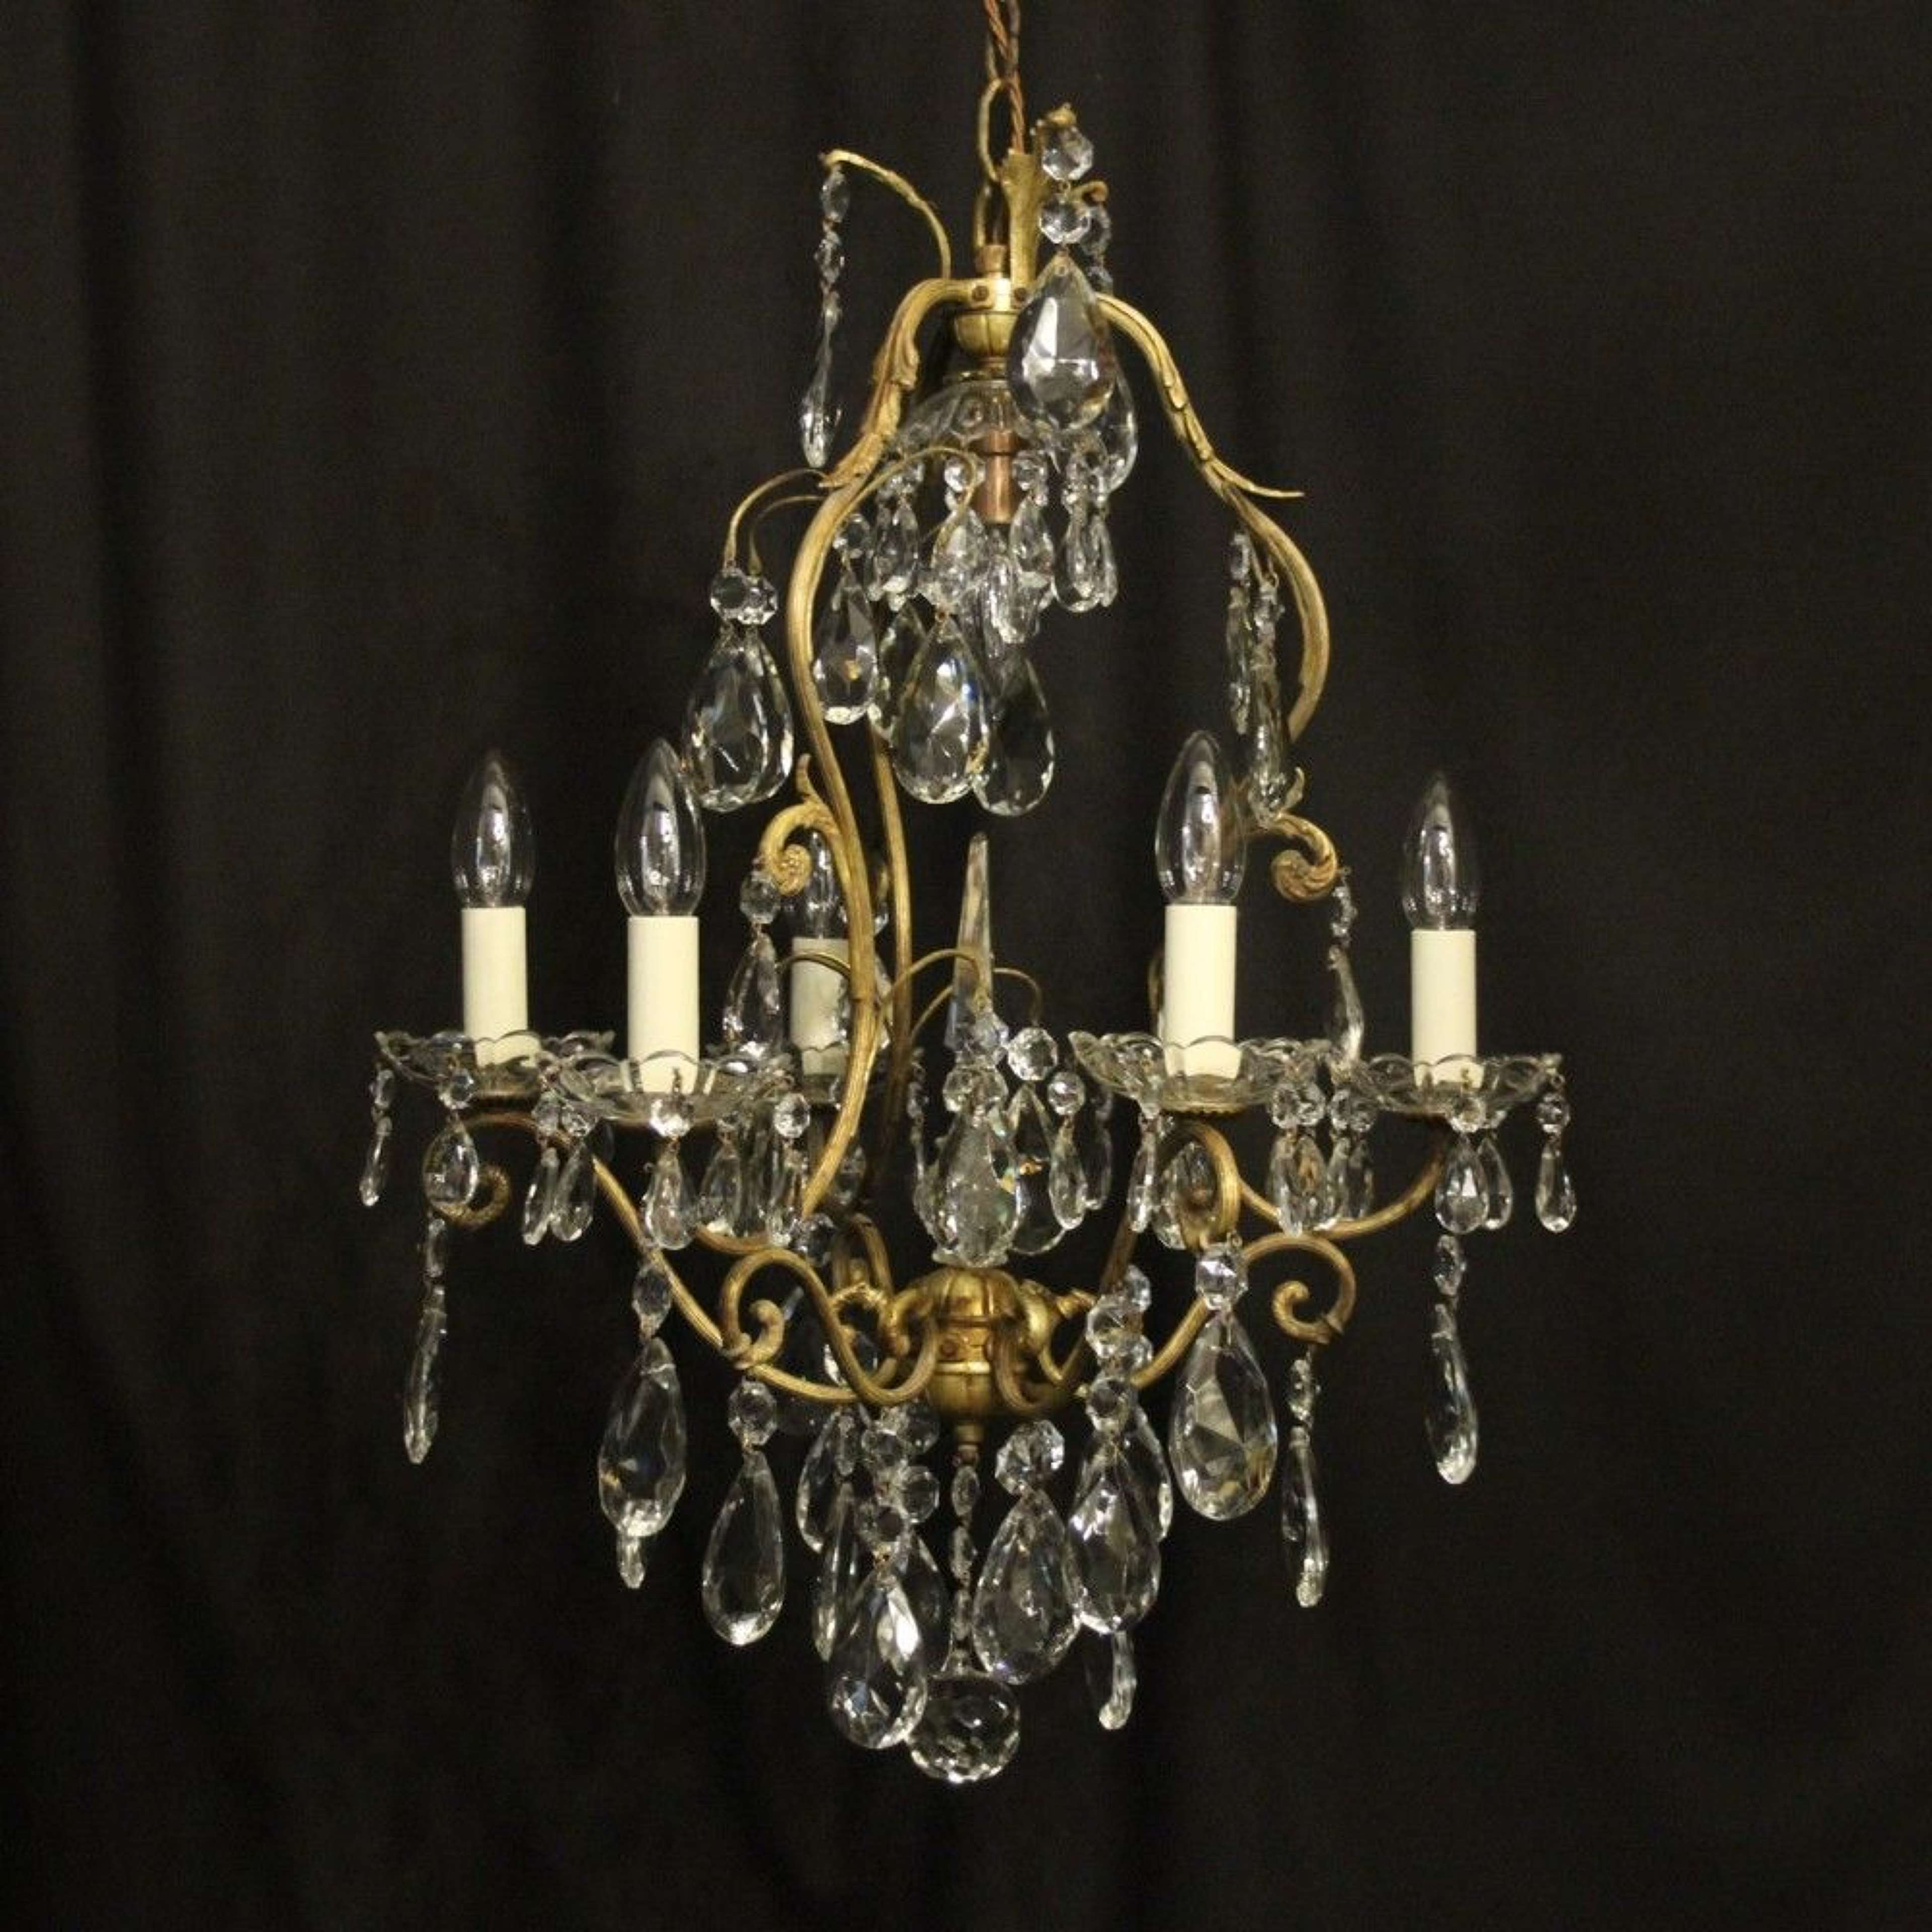 French Gilded Birdcage 7 Light Antique Chandelier